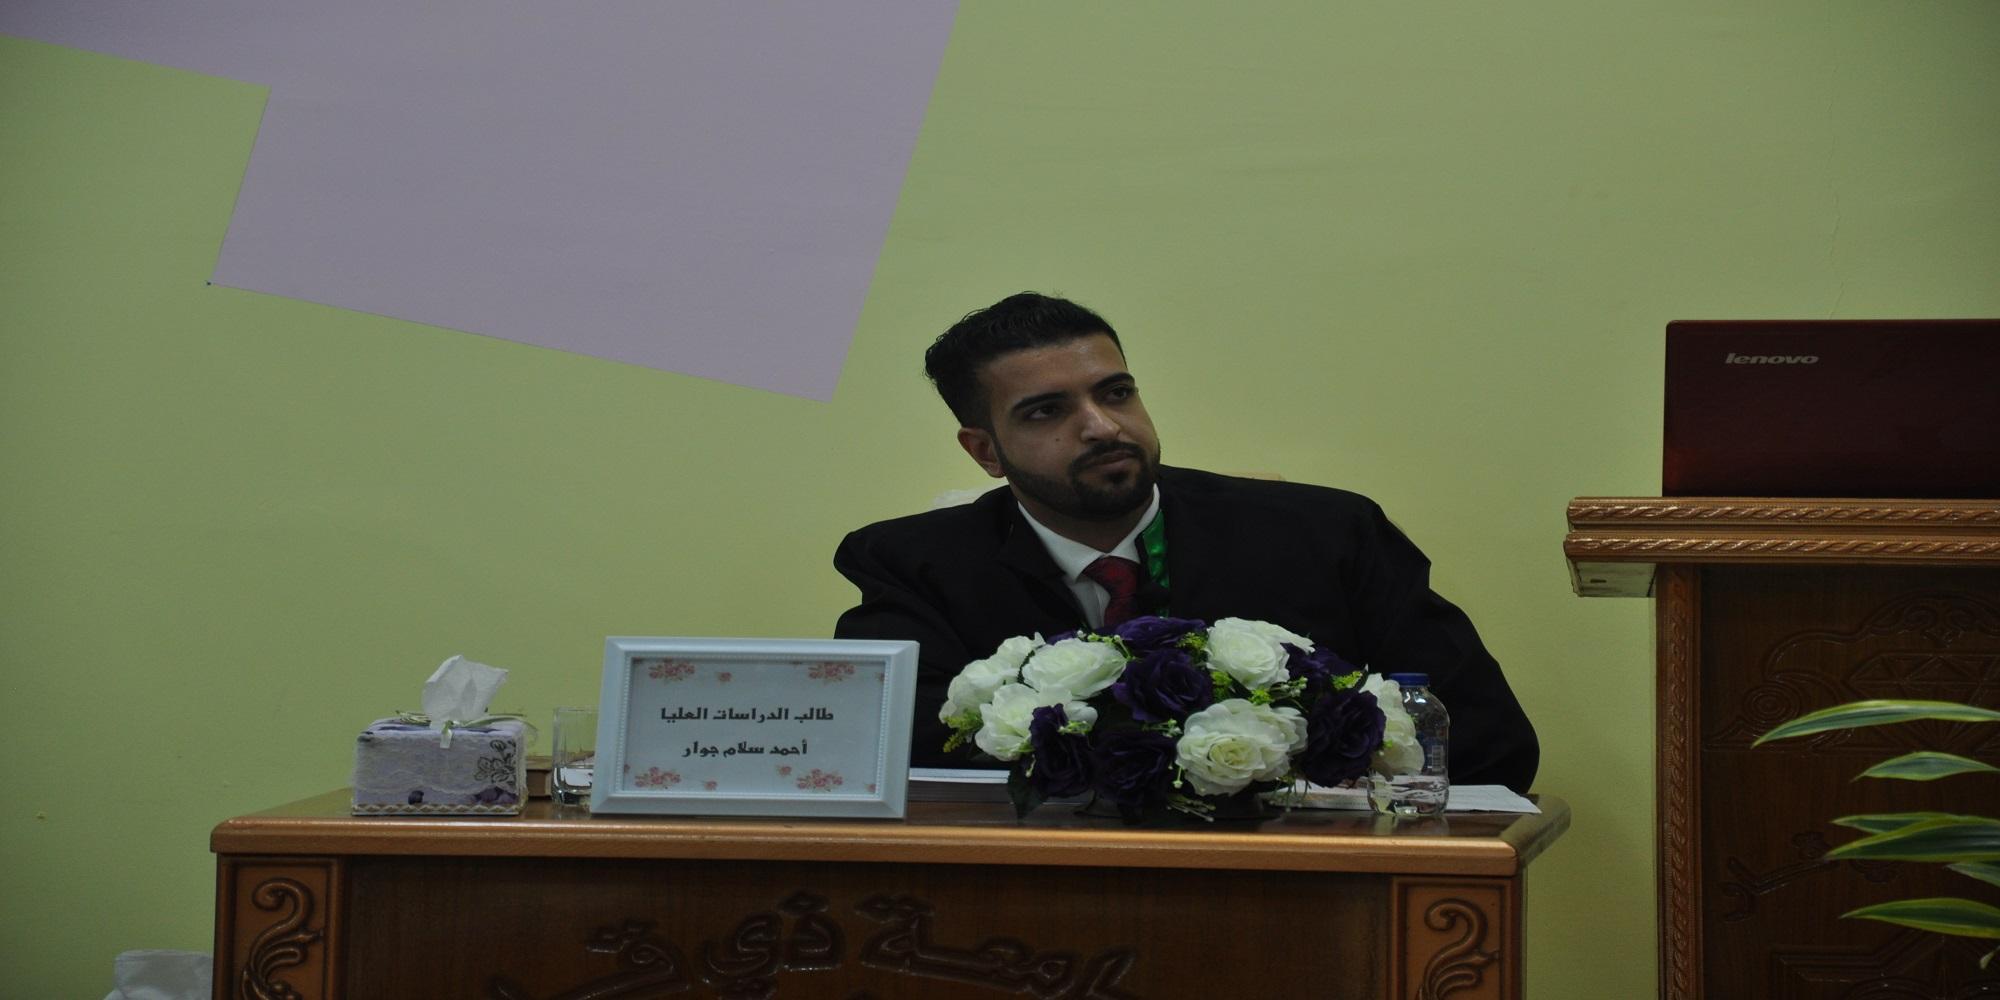 أحمد سلام جوار